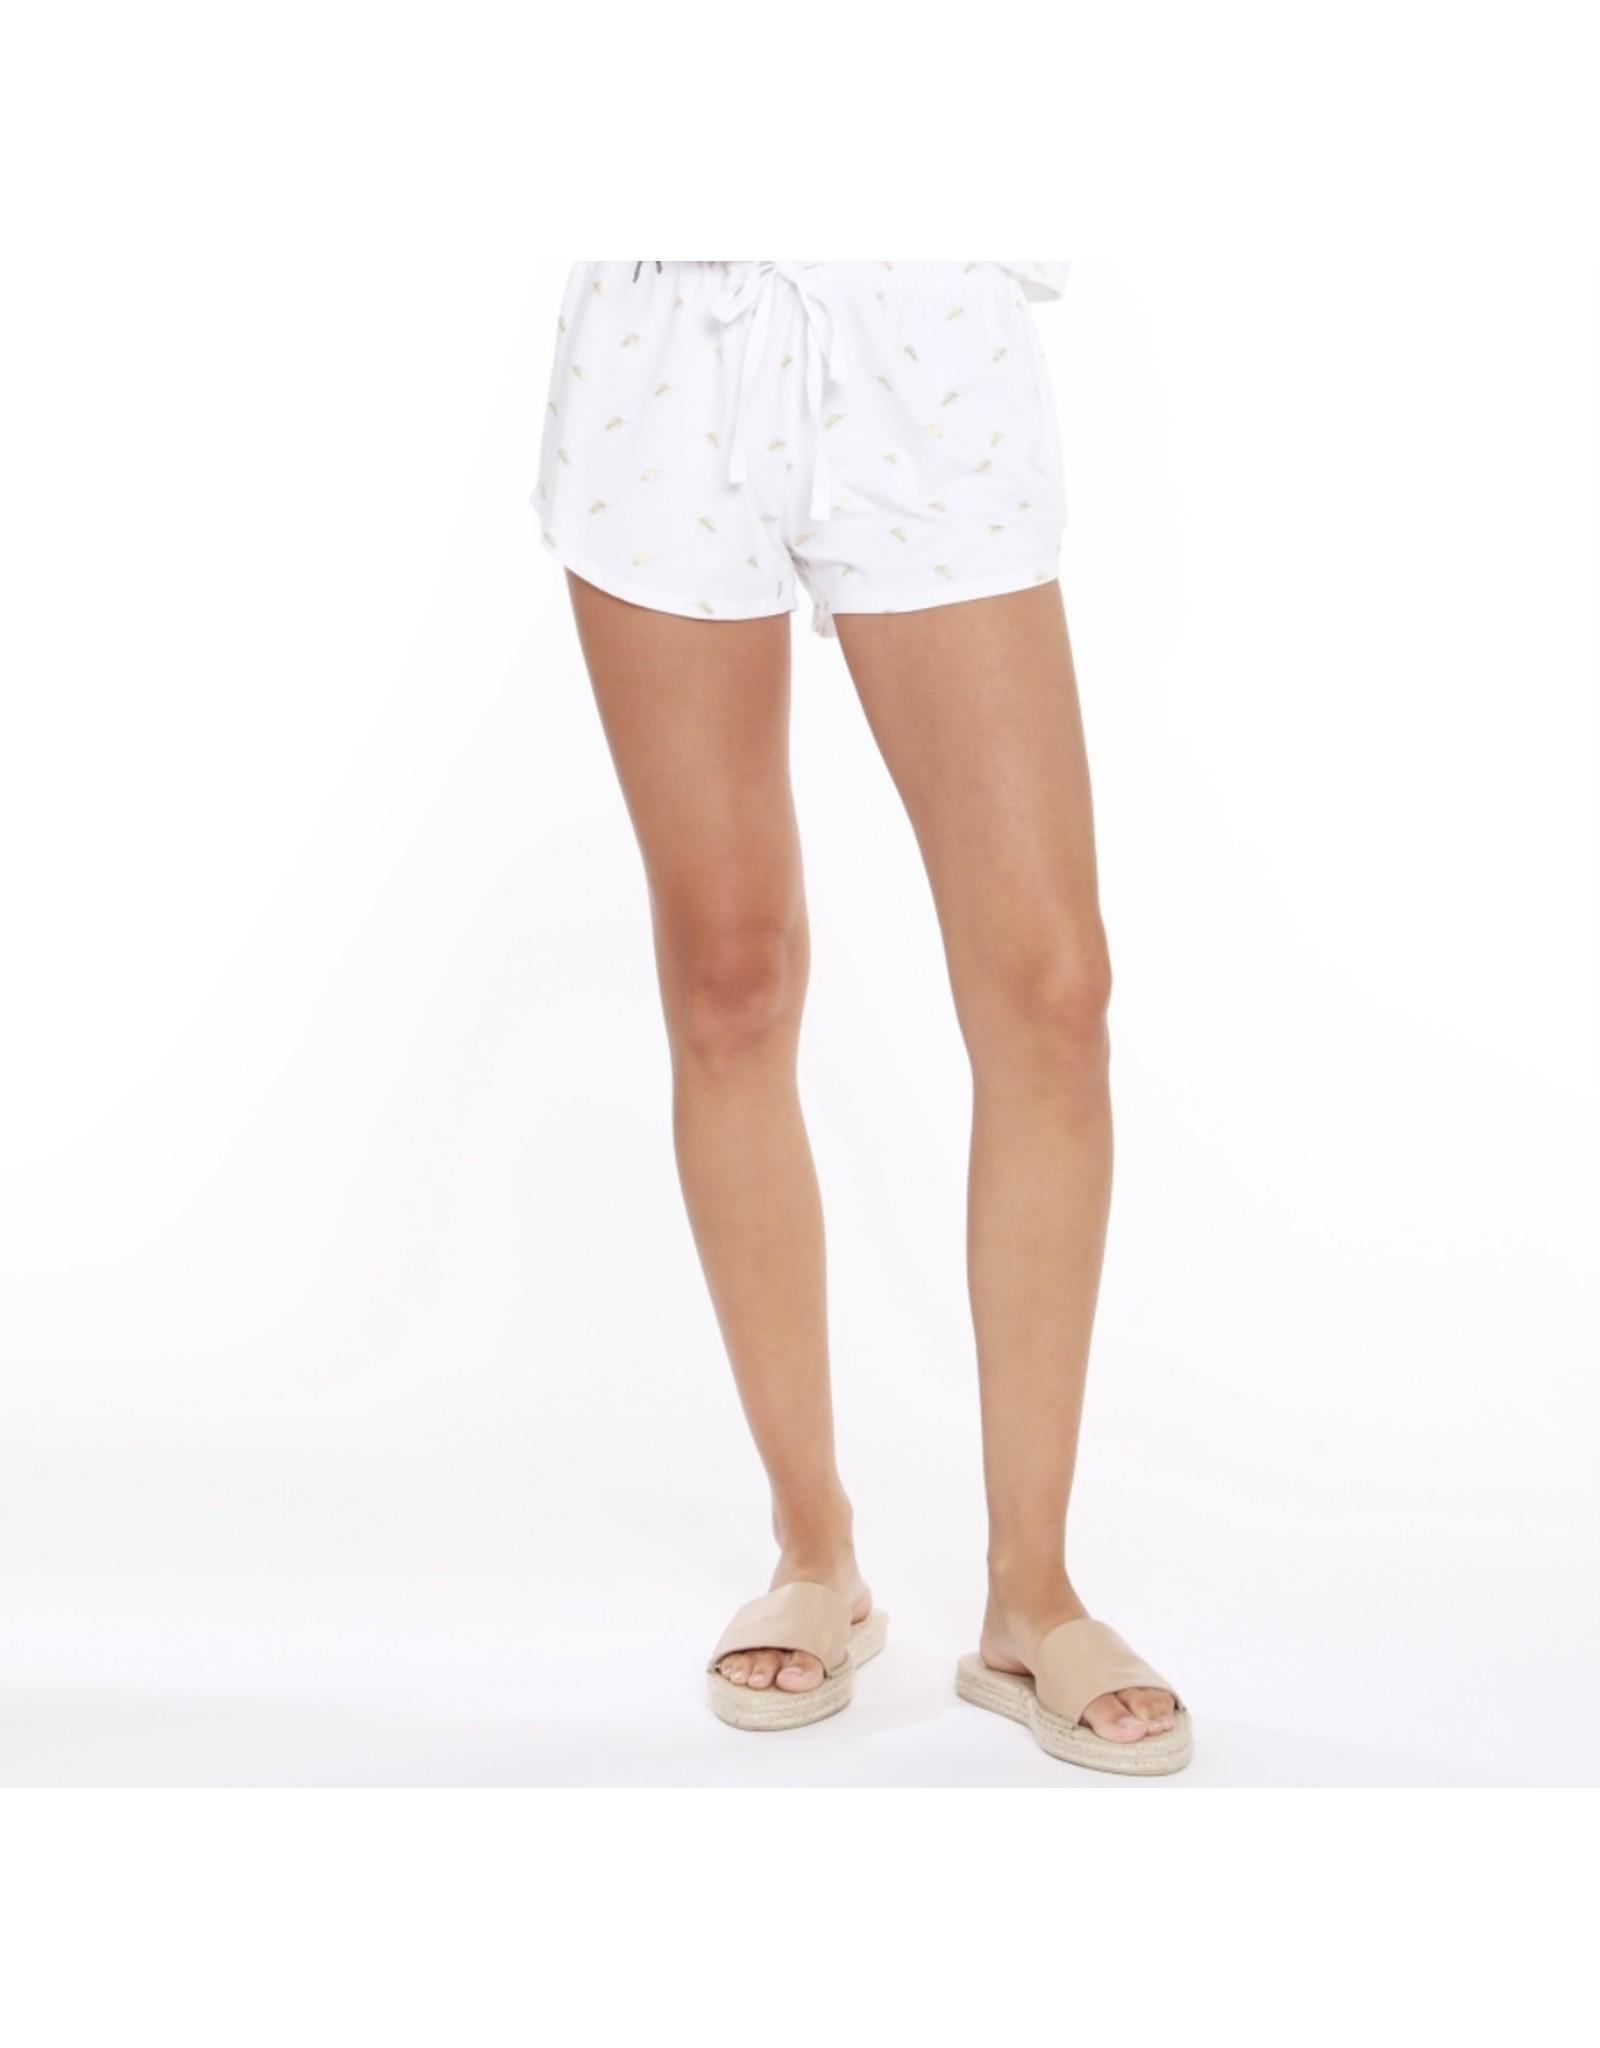 Bobi Los Angeles Bobi Los Angeles Elastic Waist Shorts